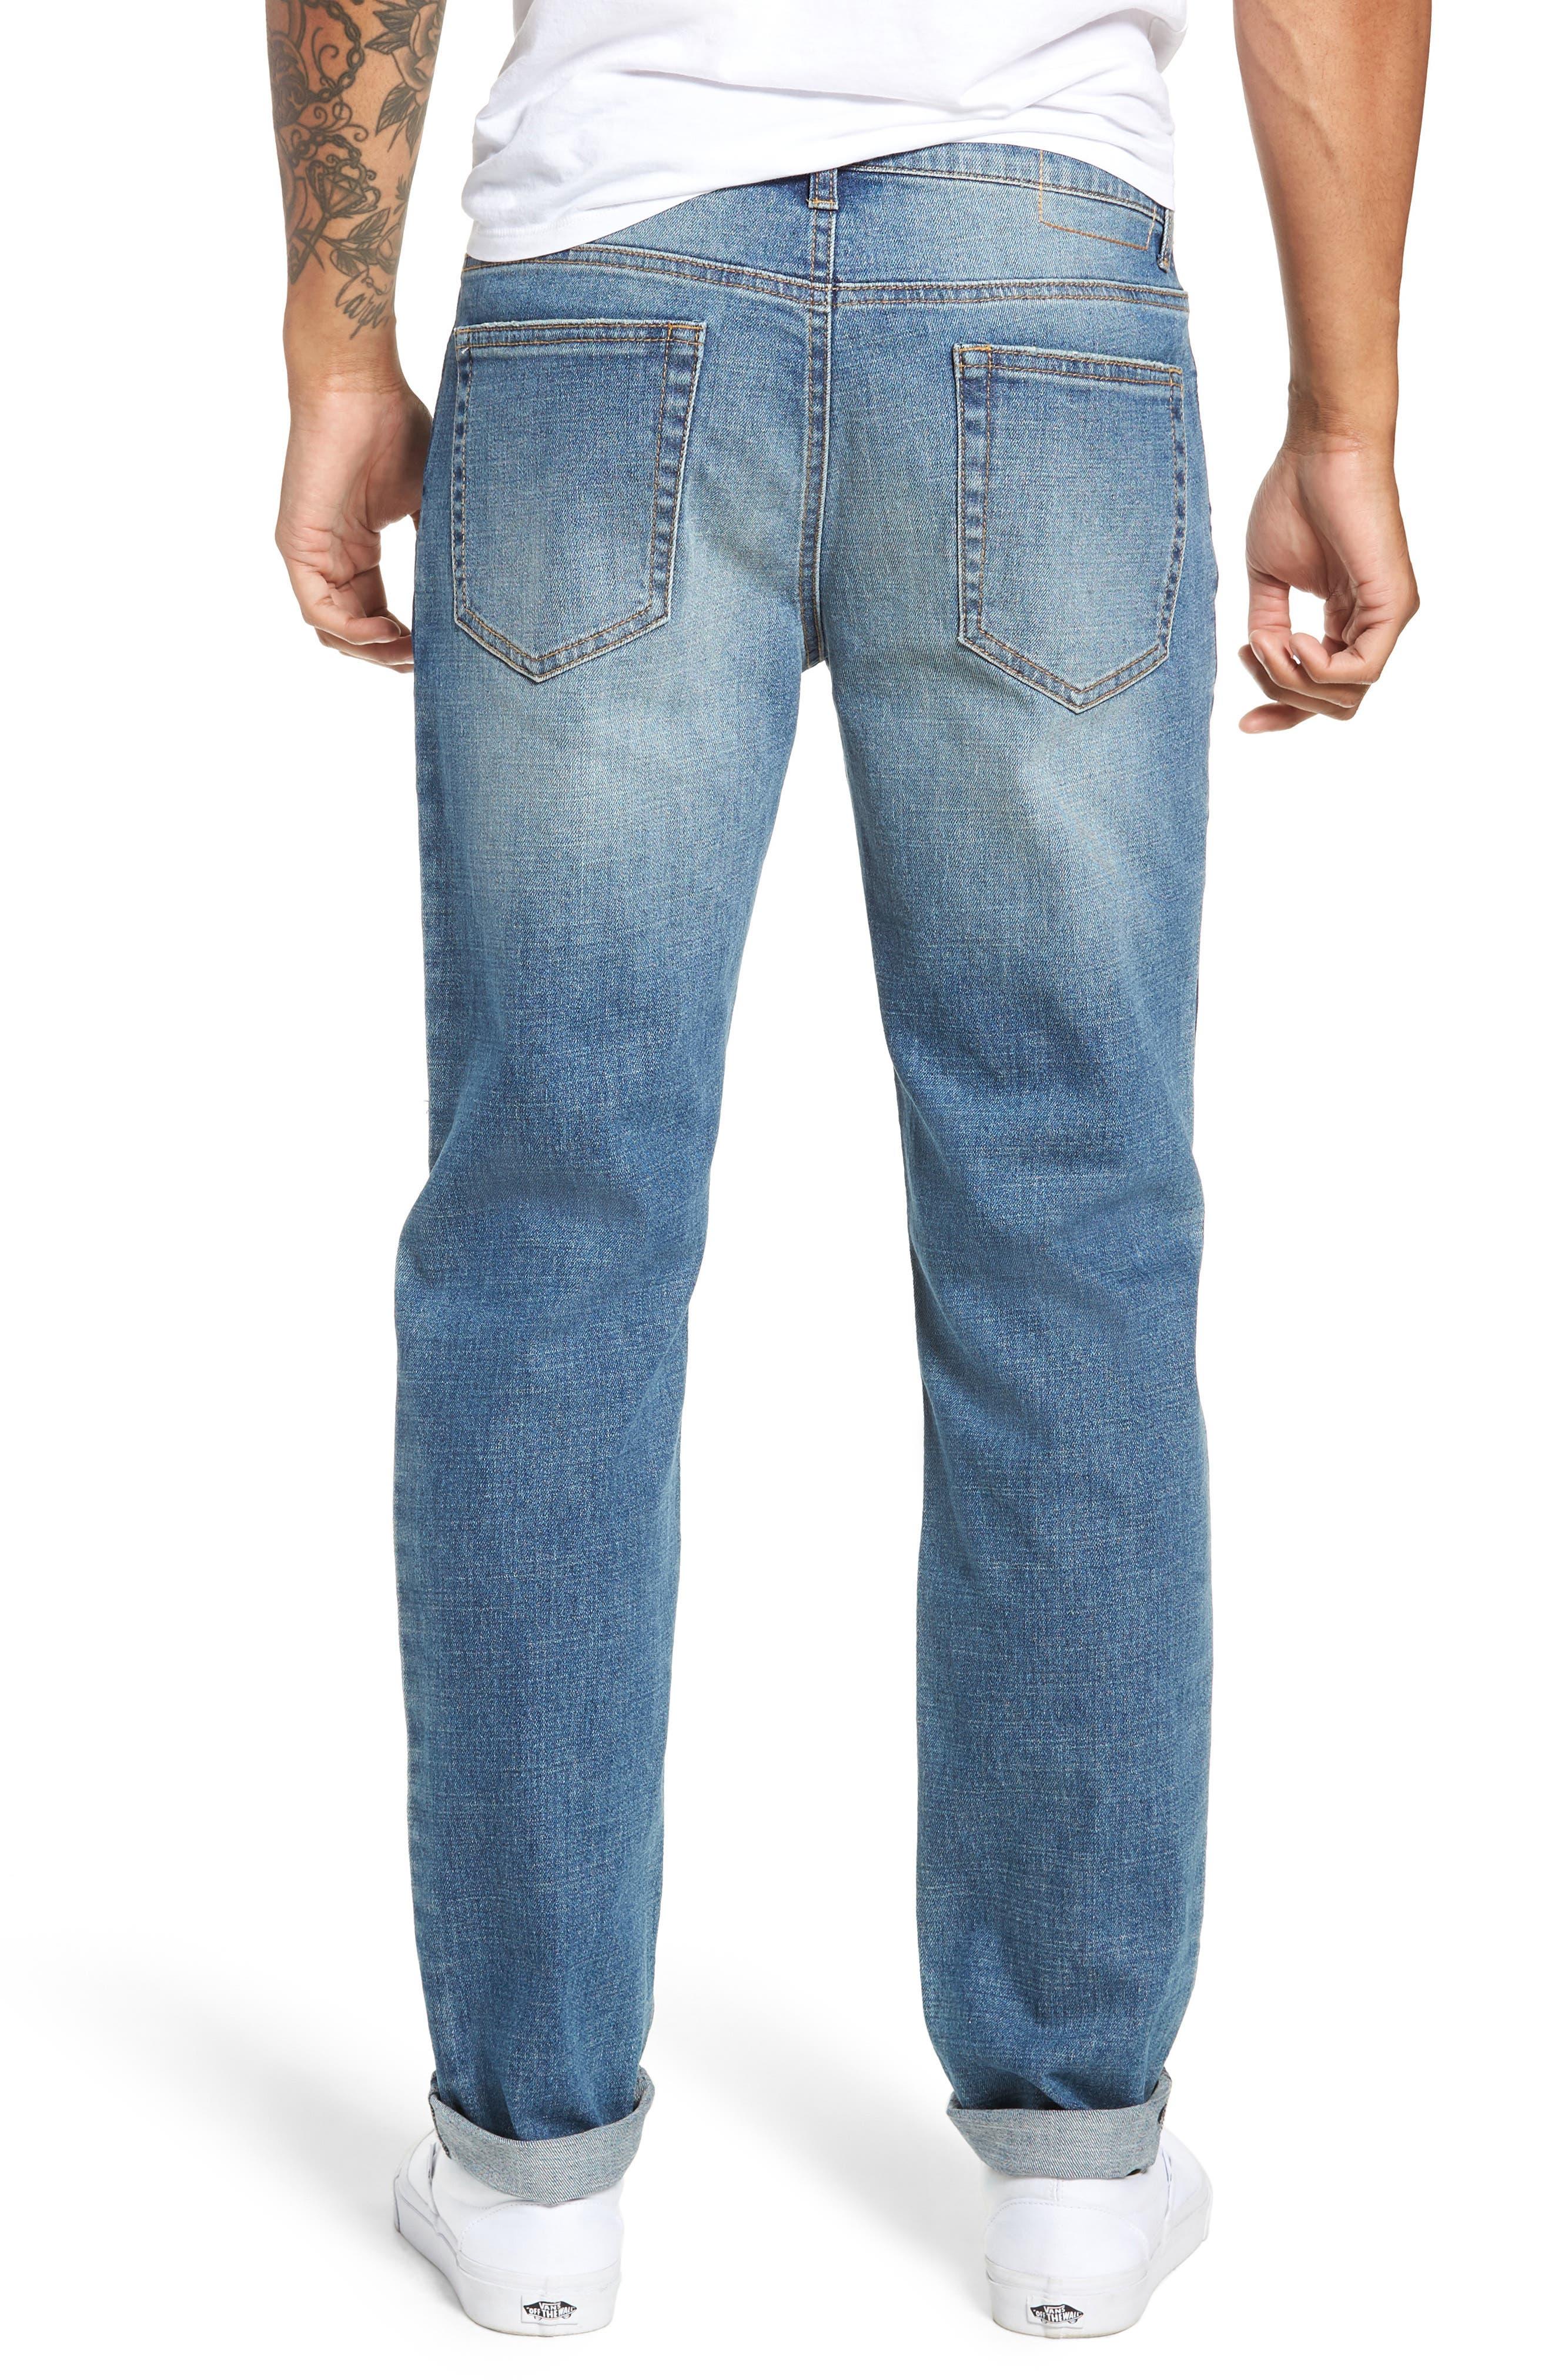 Slim Fit Side Stripe Jeans,                             Alternate thumbnail 2, color,                             BLUE STALEY WASH